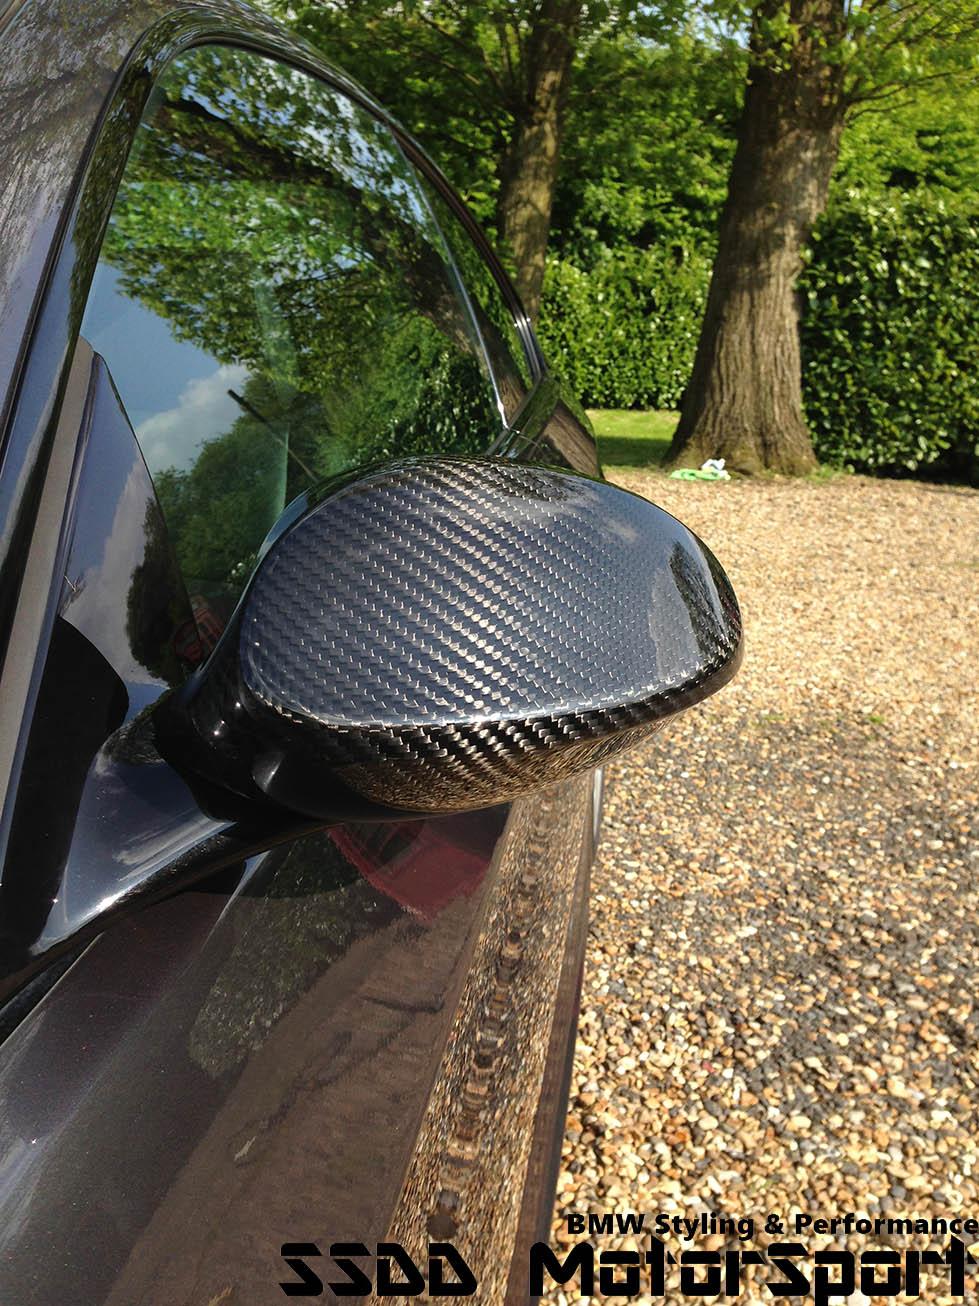 bmw-e92-e93-carbon-mirror-covers-2.jpg